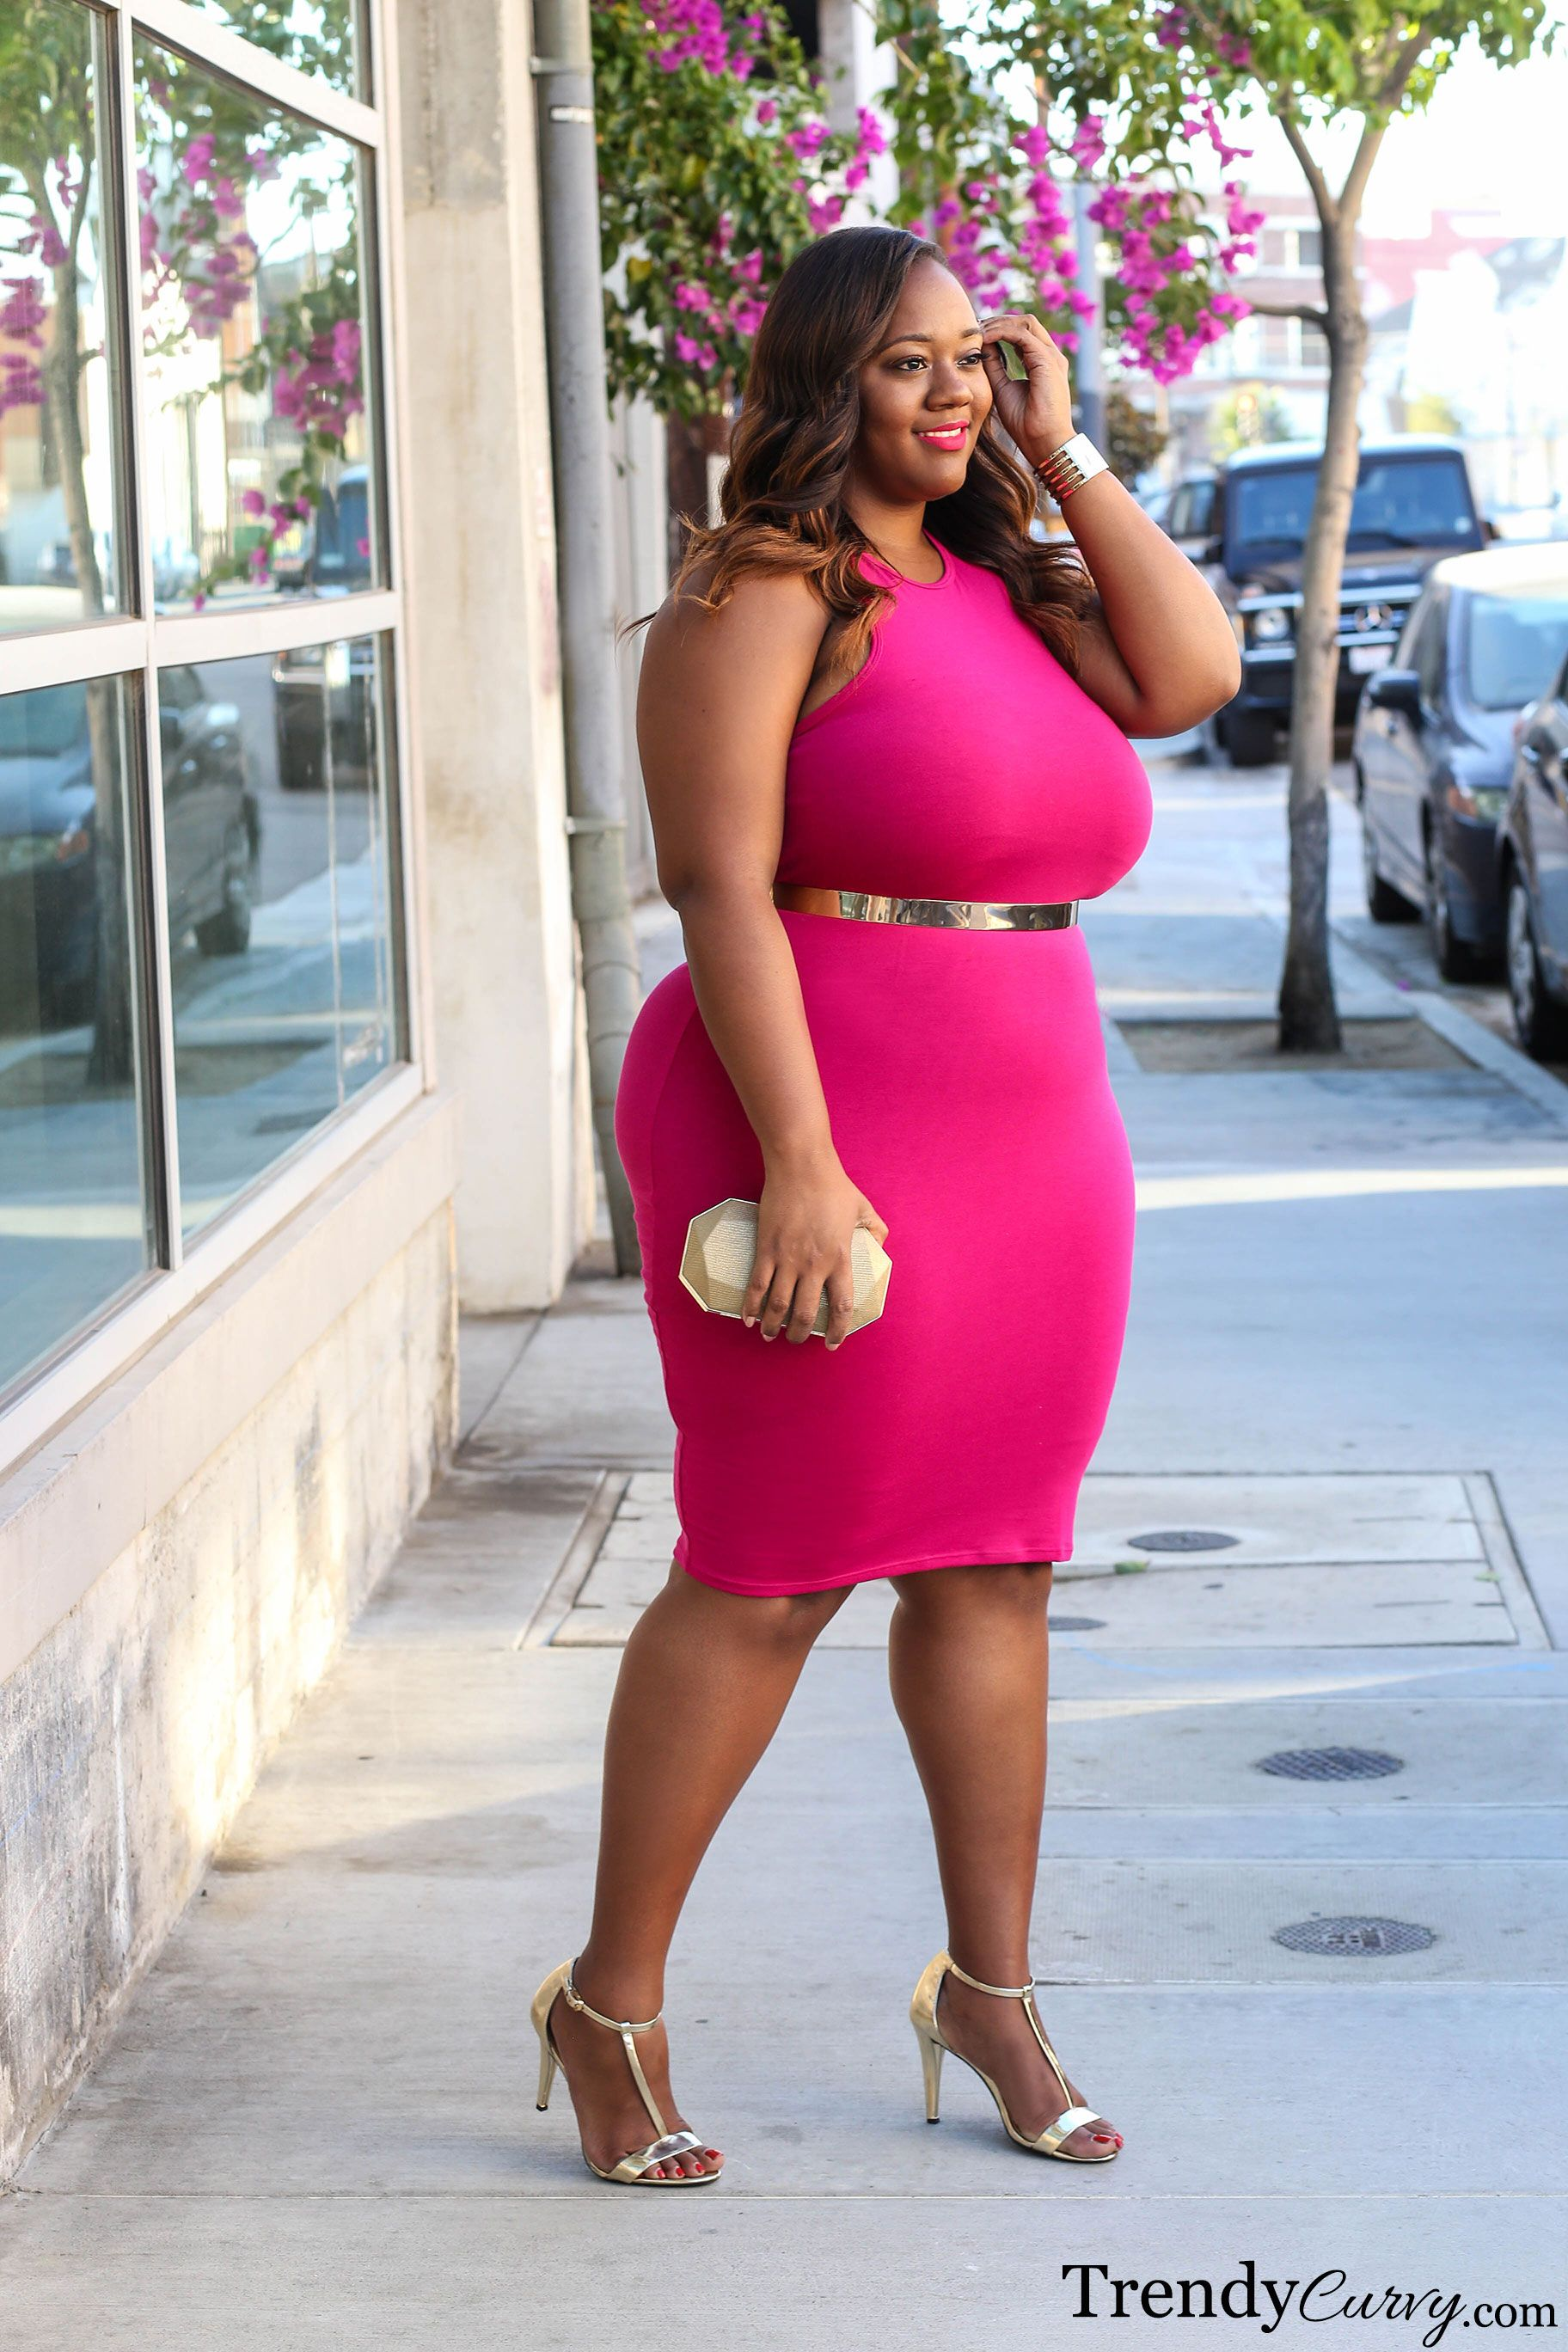 Pink Body 1824 2736 Curvy Pinterest Curvy And Fashion